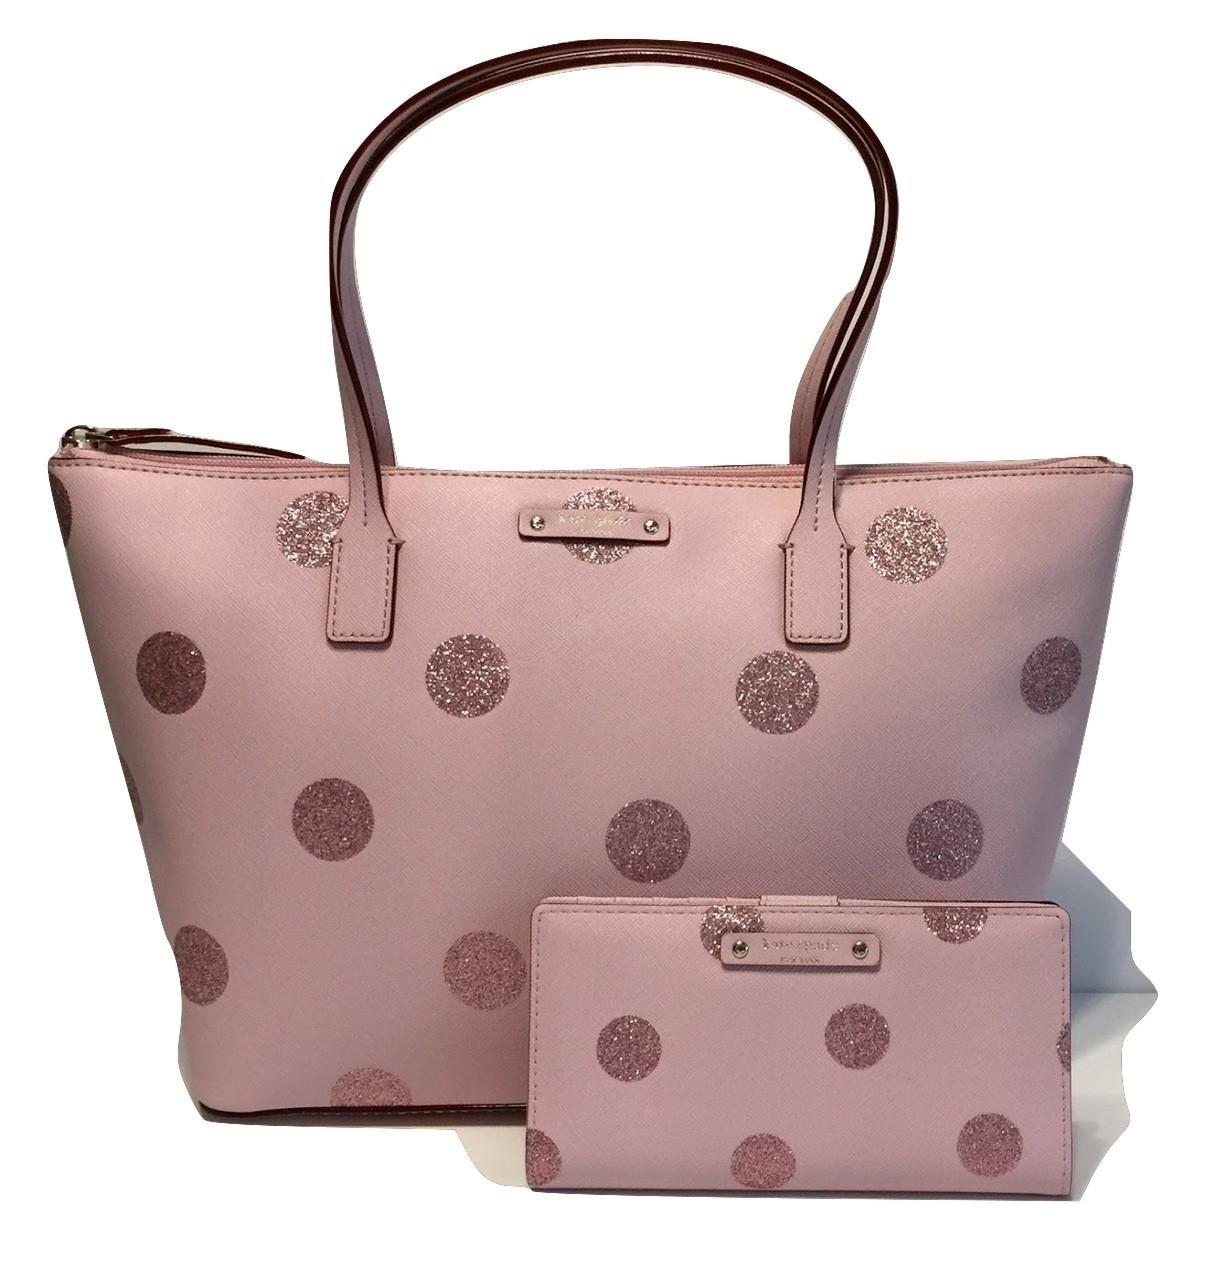 96c1930dc787 Kate Spade Haven Lane Hani Handbag And Stacy Set Shoulder Bag. Get one of  the hottest styles of the season! The Kate Spade Haven Lane Hani Handbag  And Stacy ...